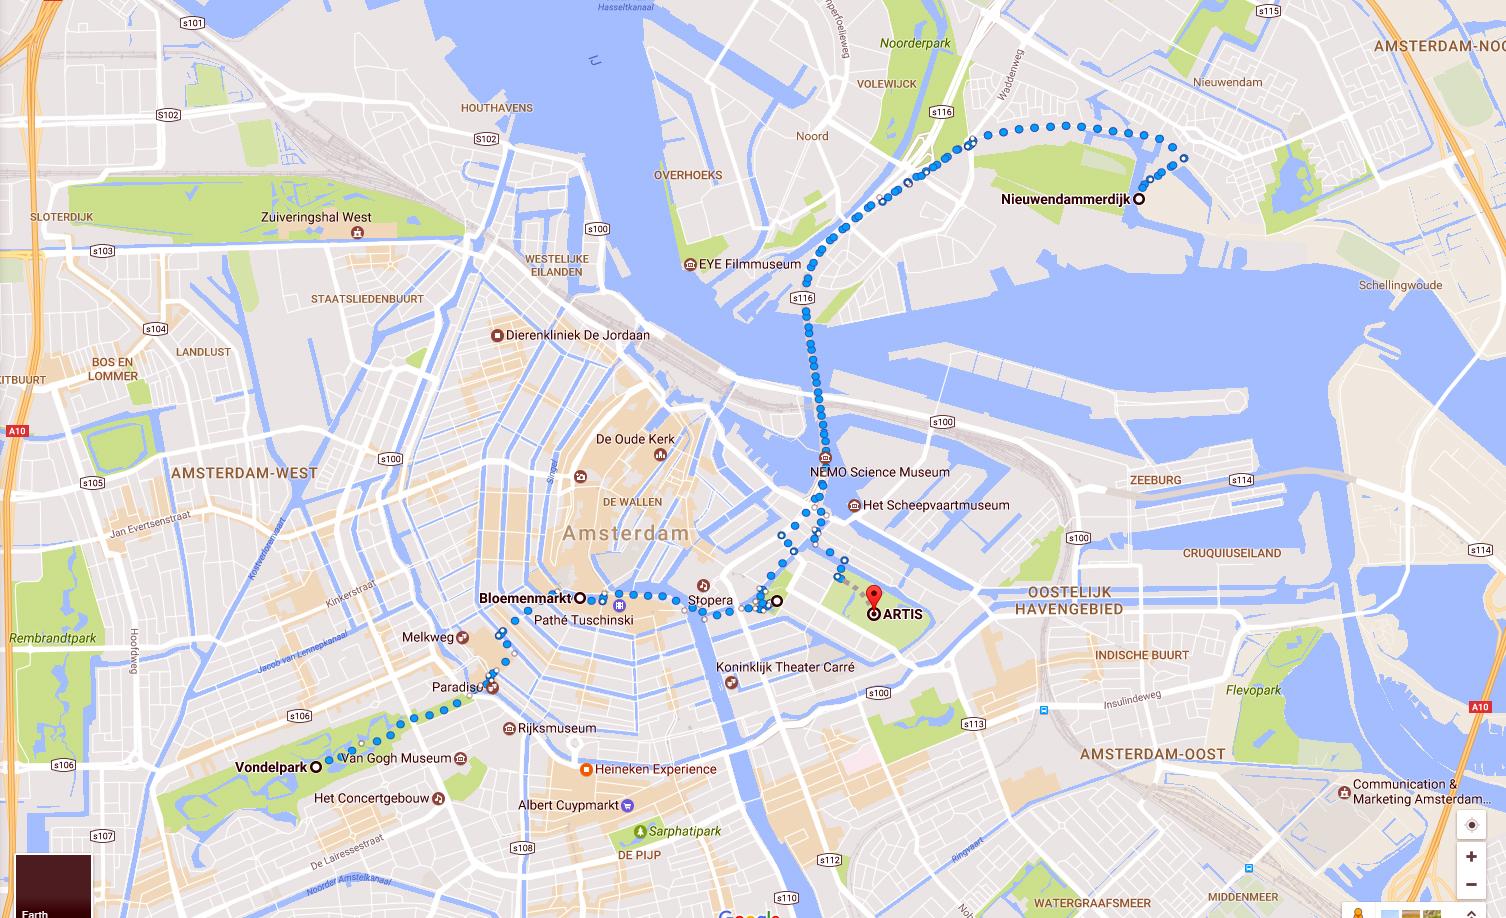 KLM_Amsterdam_Recreational_Walk